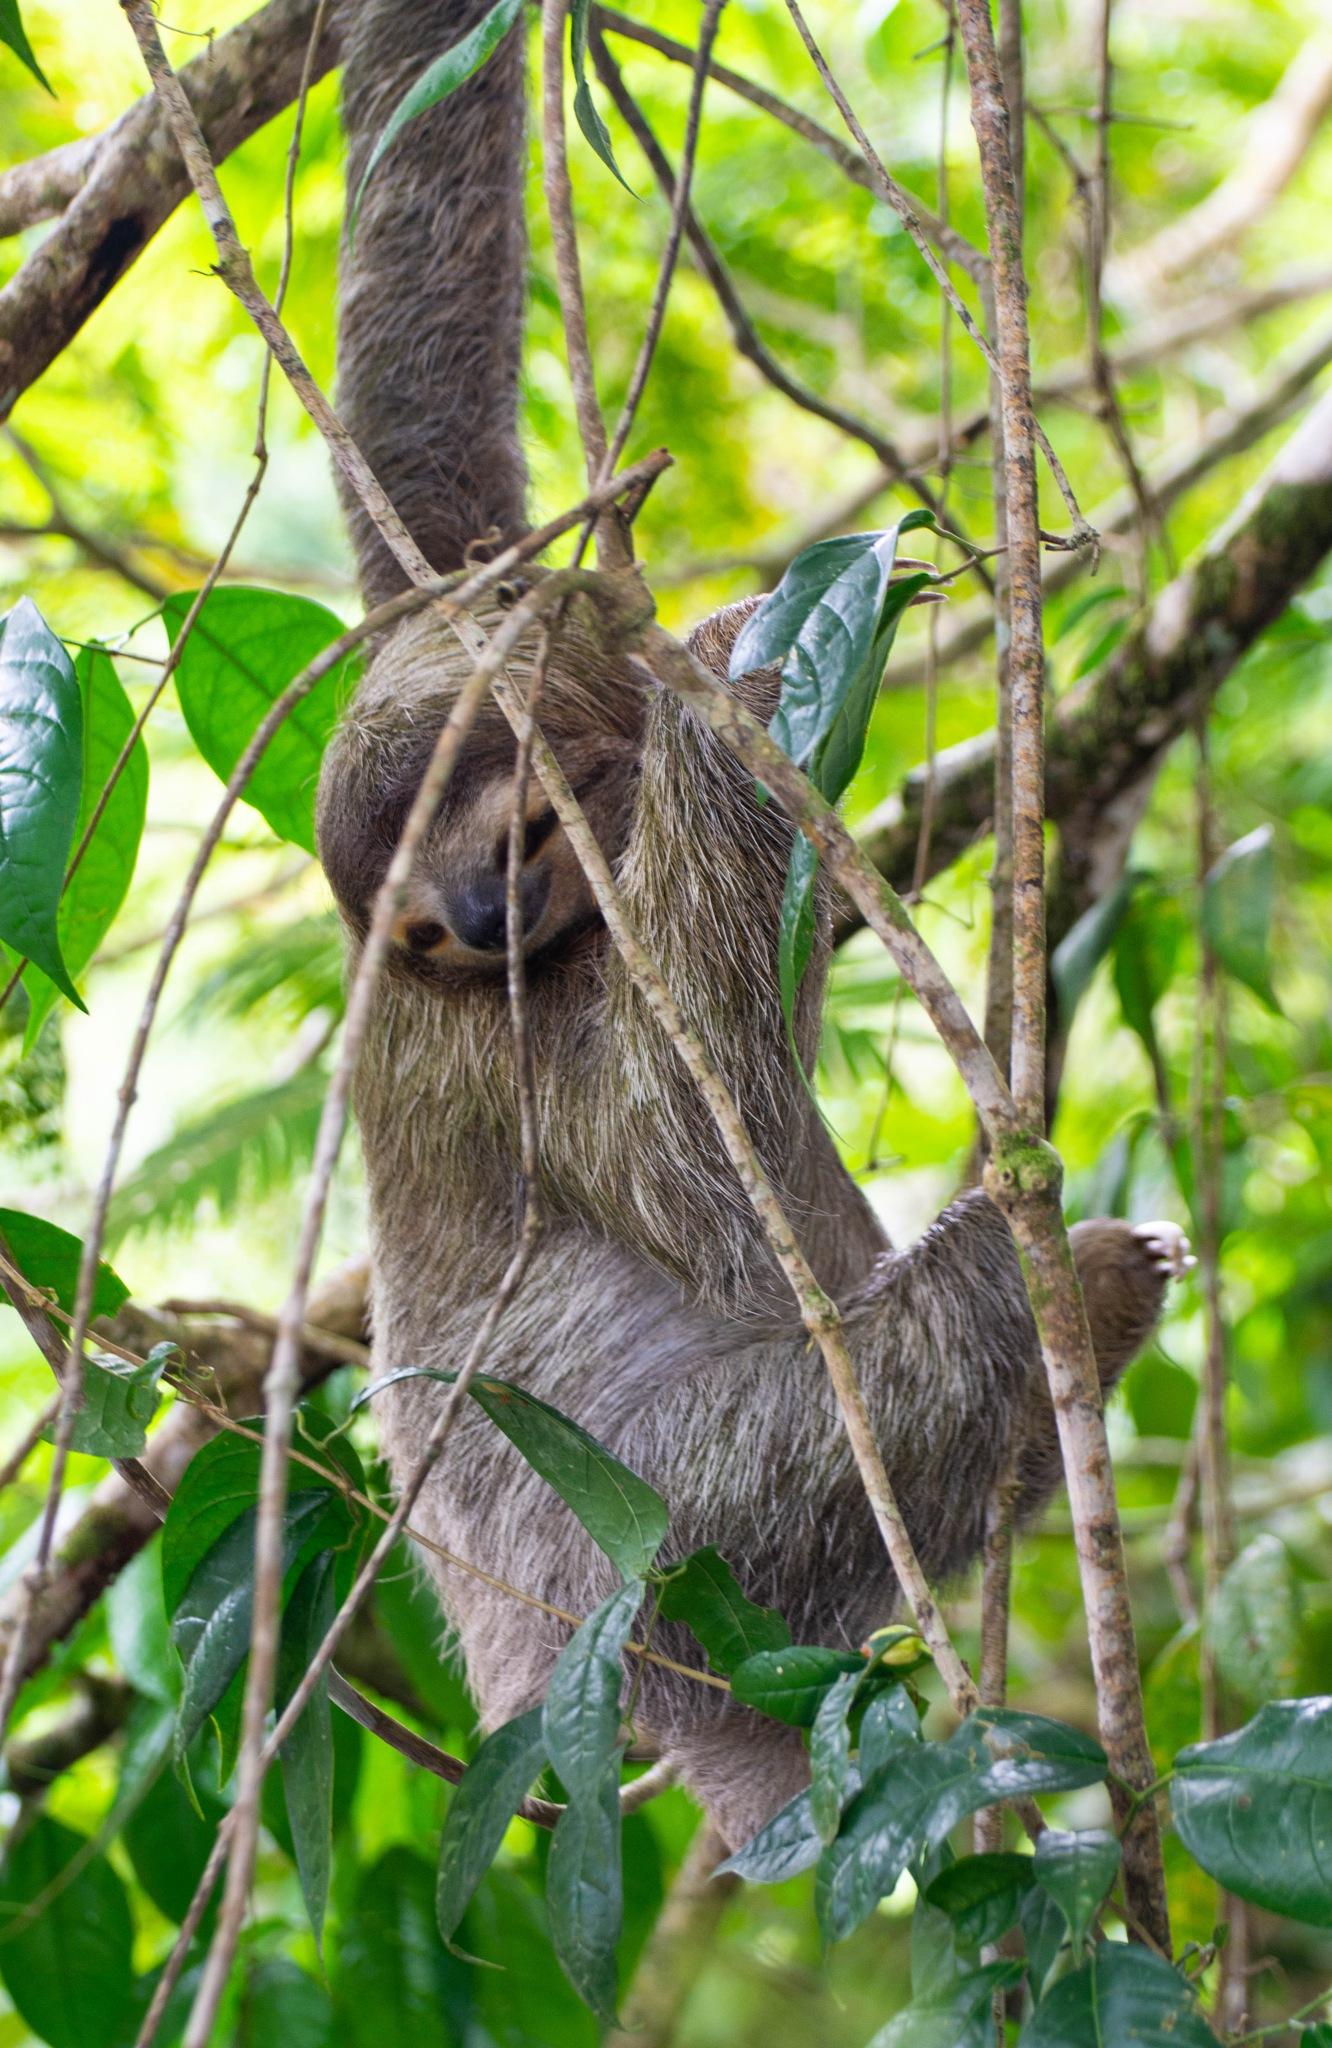 Three-toed sloth by sarahjane1971